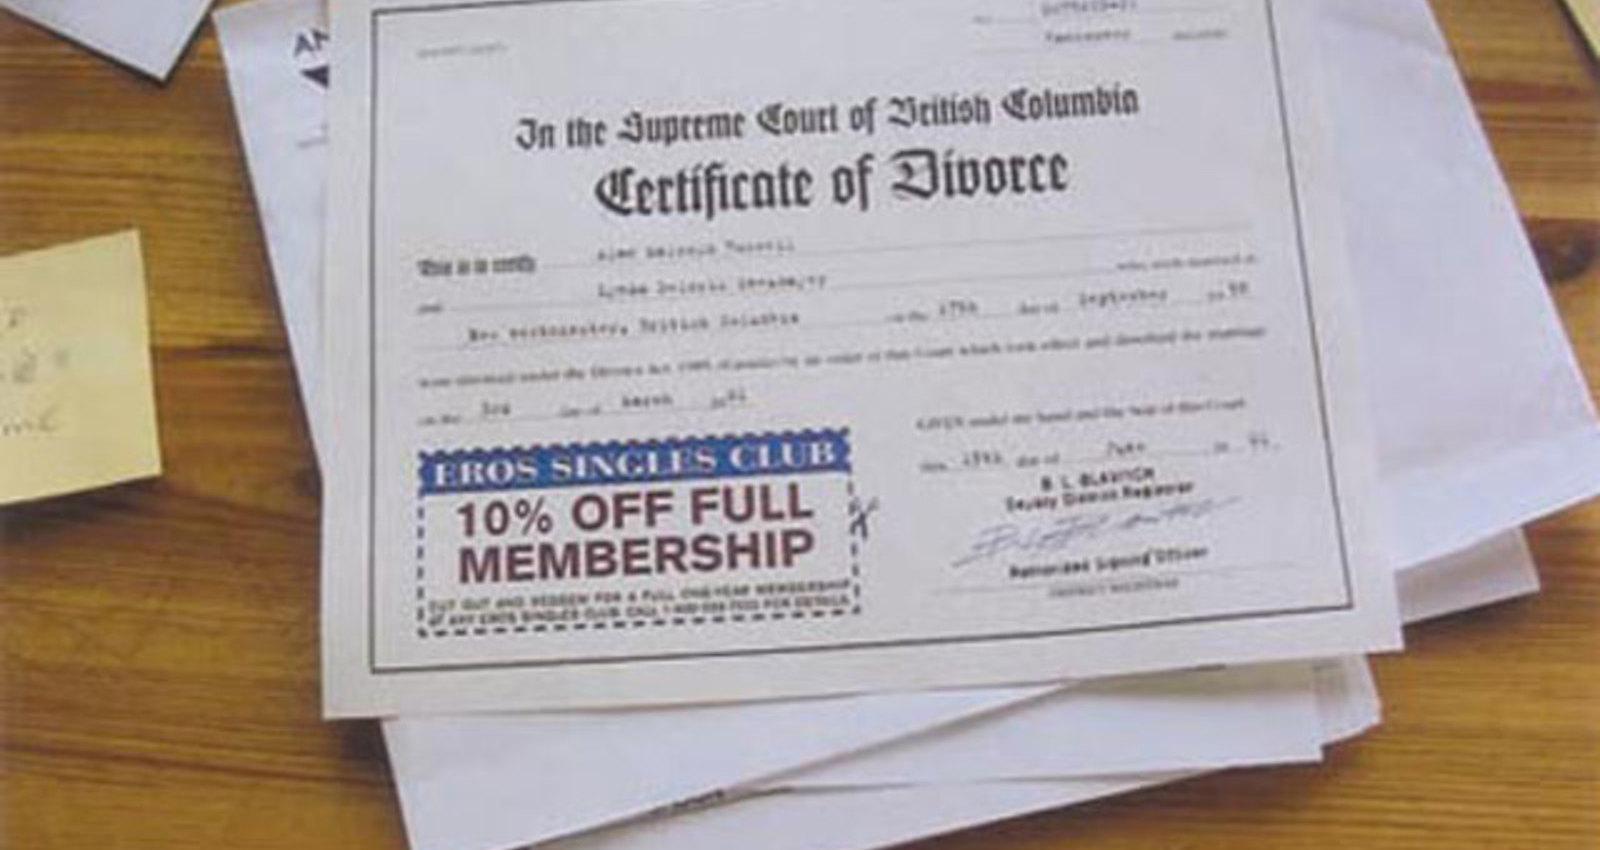 Bible, Toe Tag, Divorce Certificate